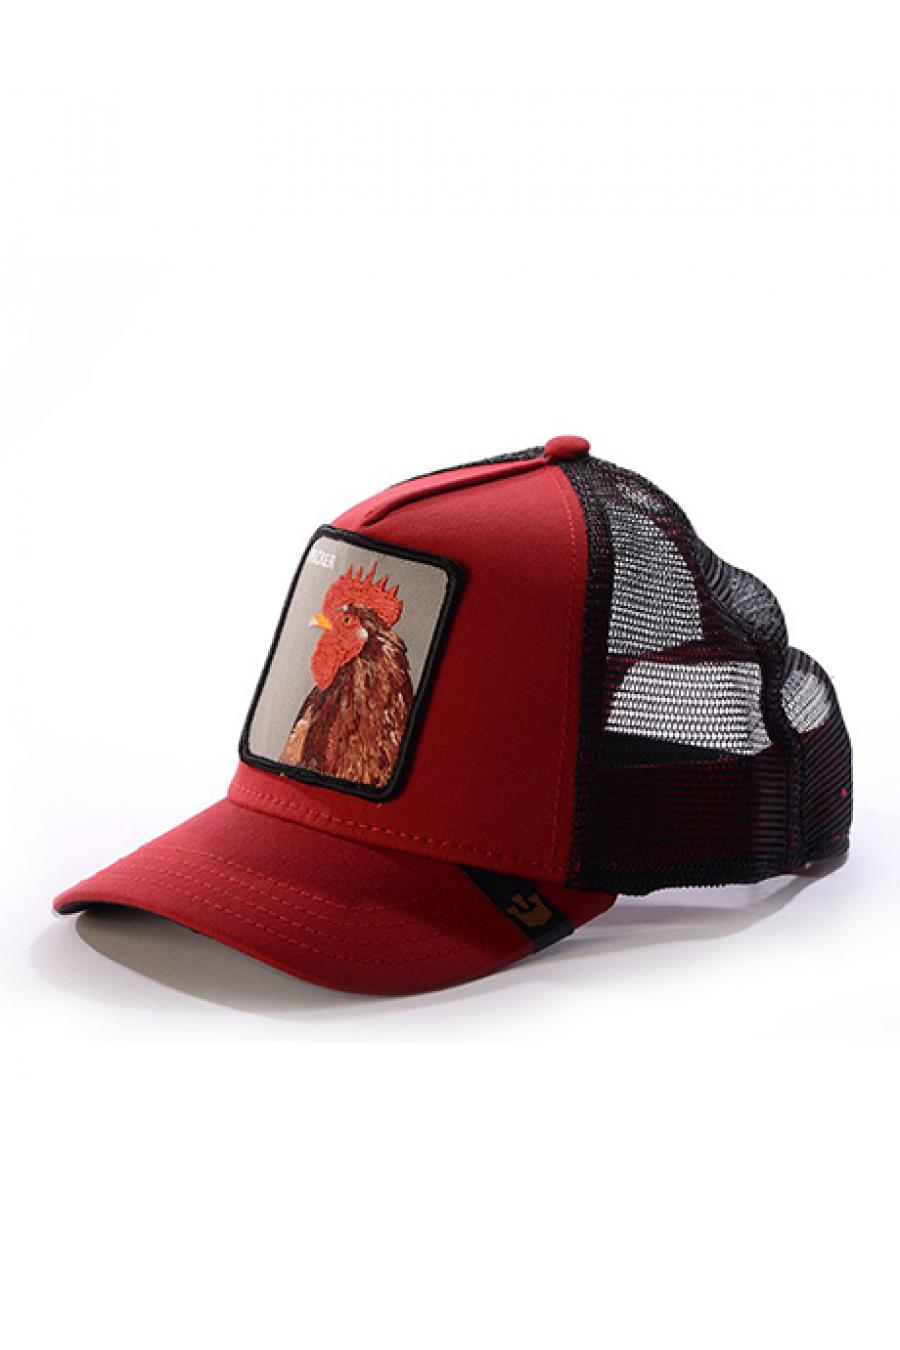 Goorin Bros- Plucker Red Şapka